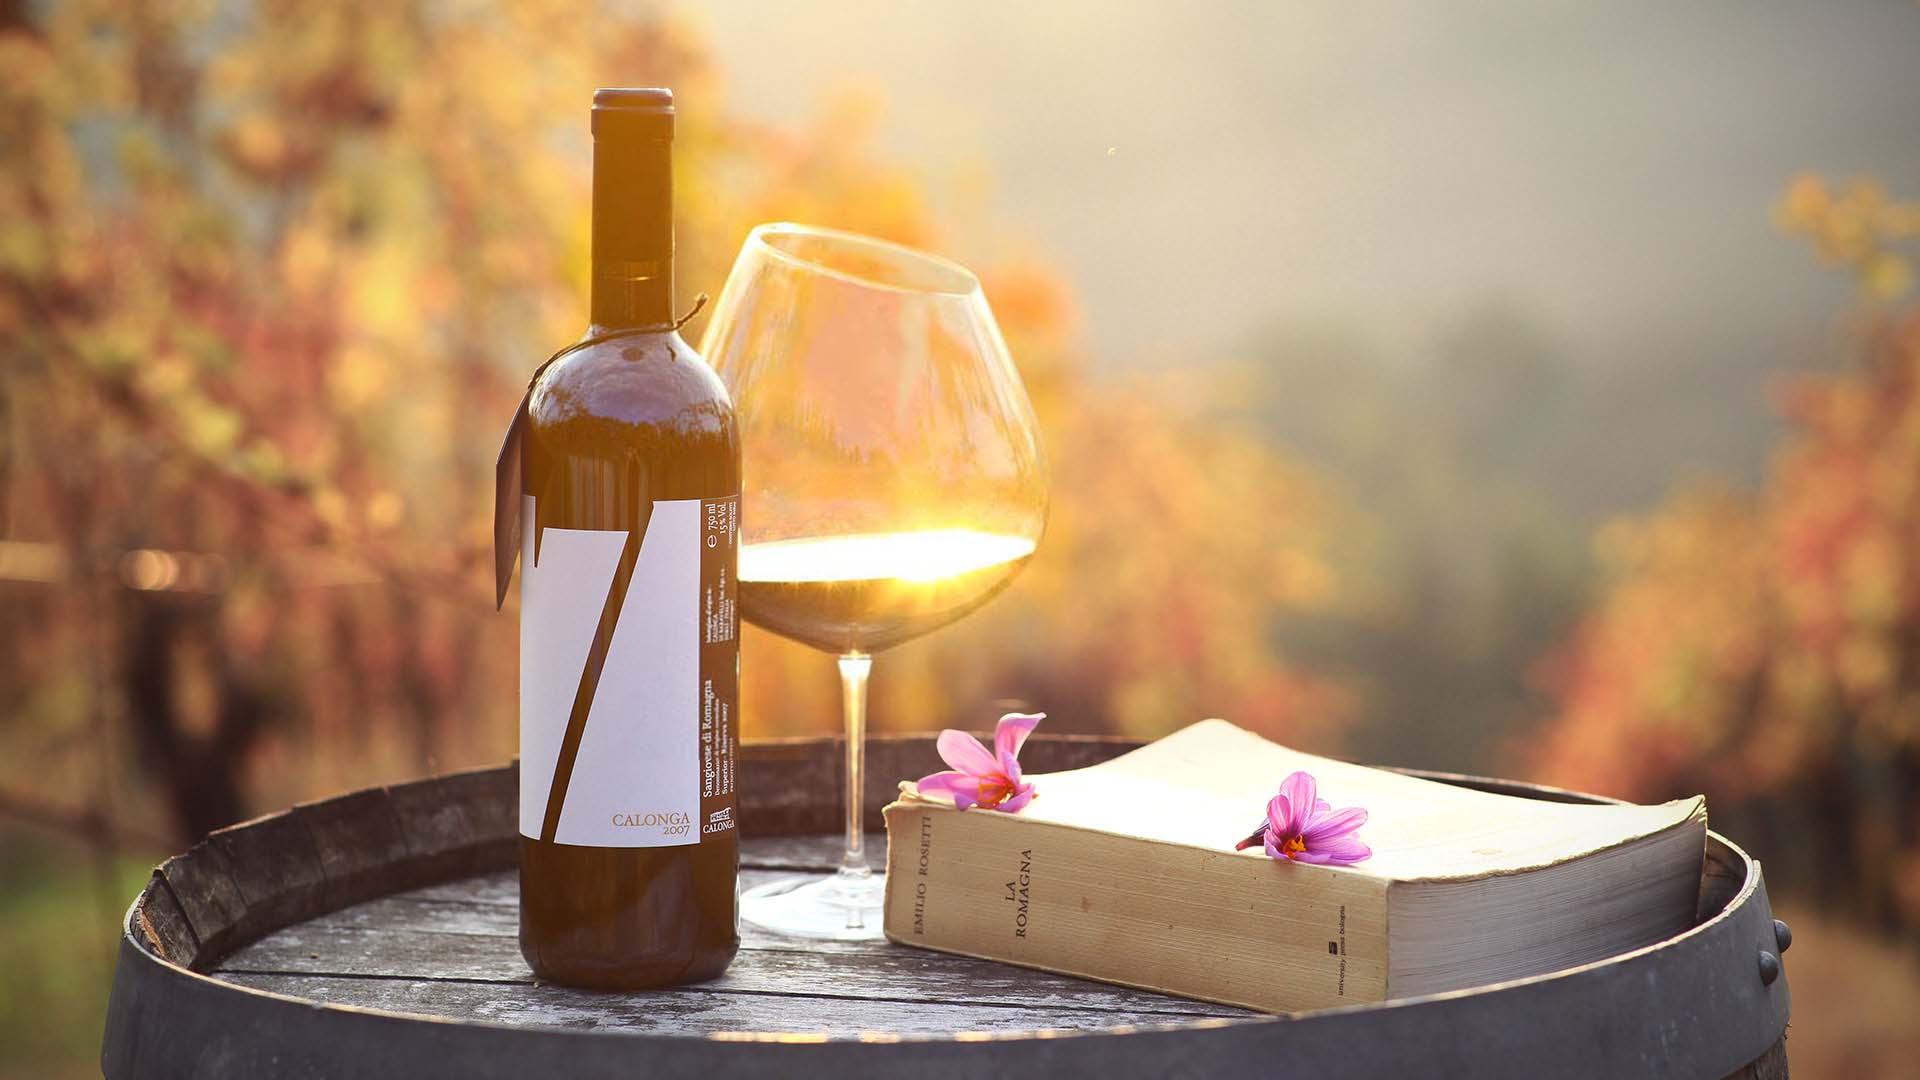 Calonga, azienda agricola, Forlì, vinicoltura, sangiovese, albana, pagadebit, vino, viti, filari, Baravelli, michelangelo, castellione, 7, kiria, leggiolo, ordelaffo, baldan